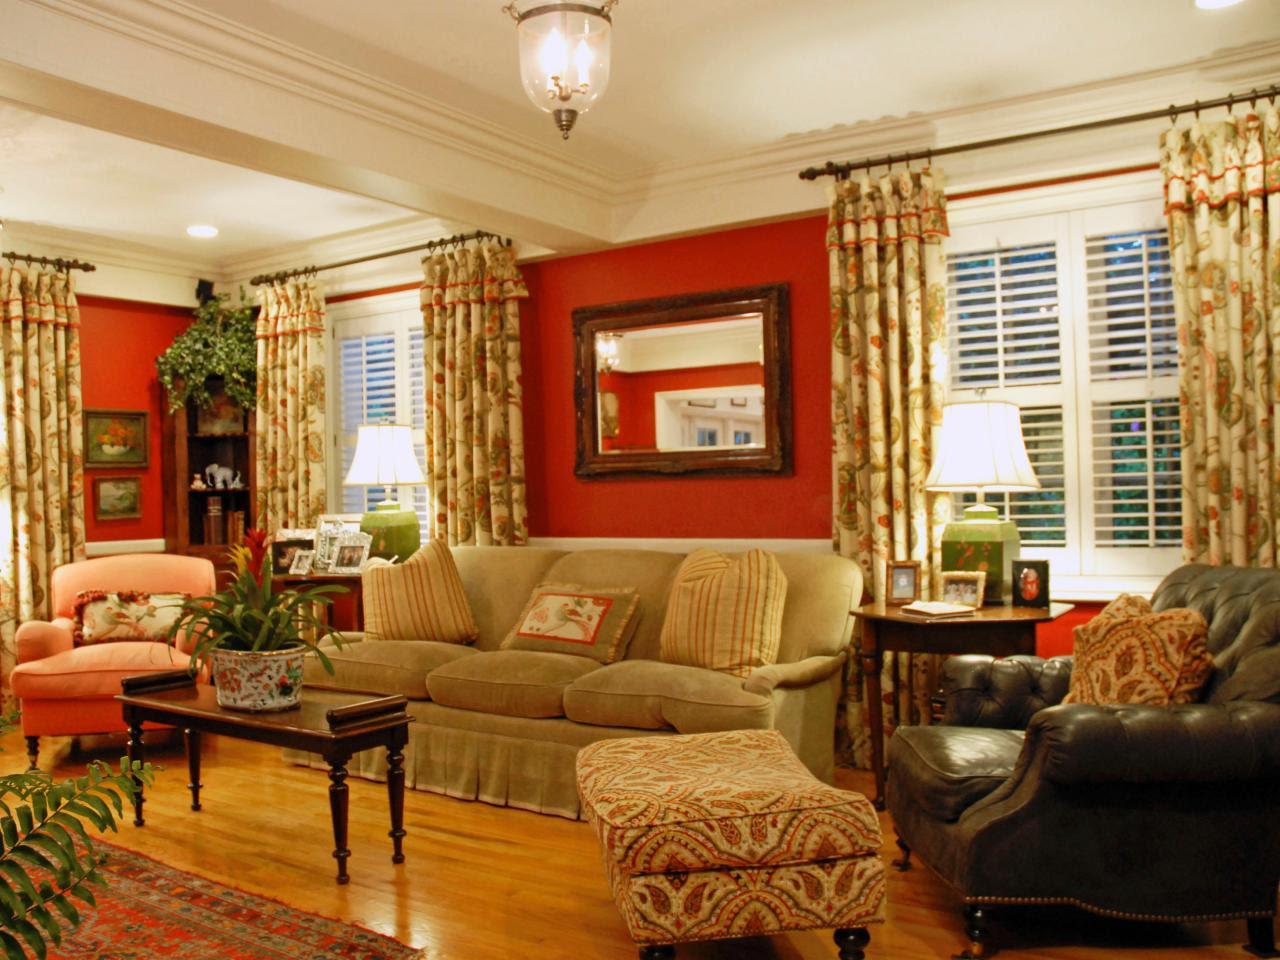 Burnt Orange And Brown Living Room - Modern House